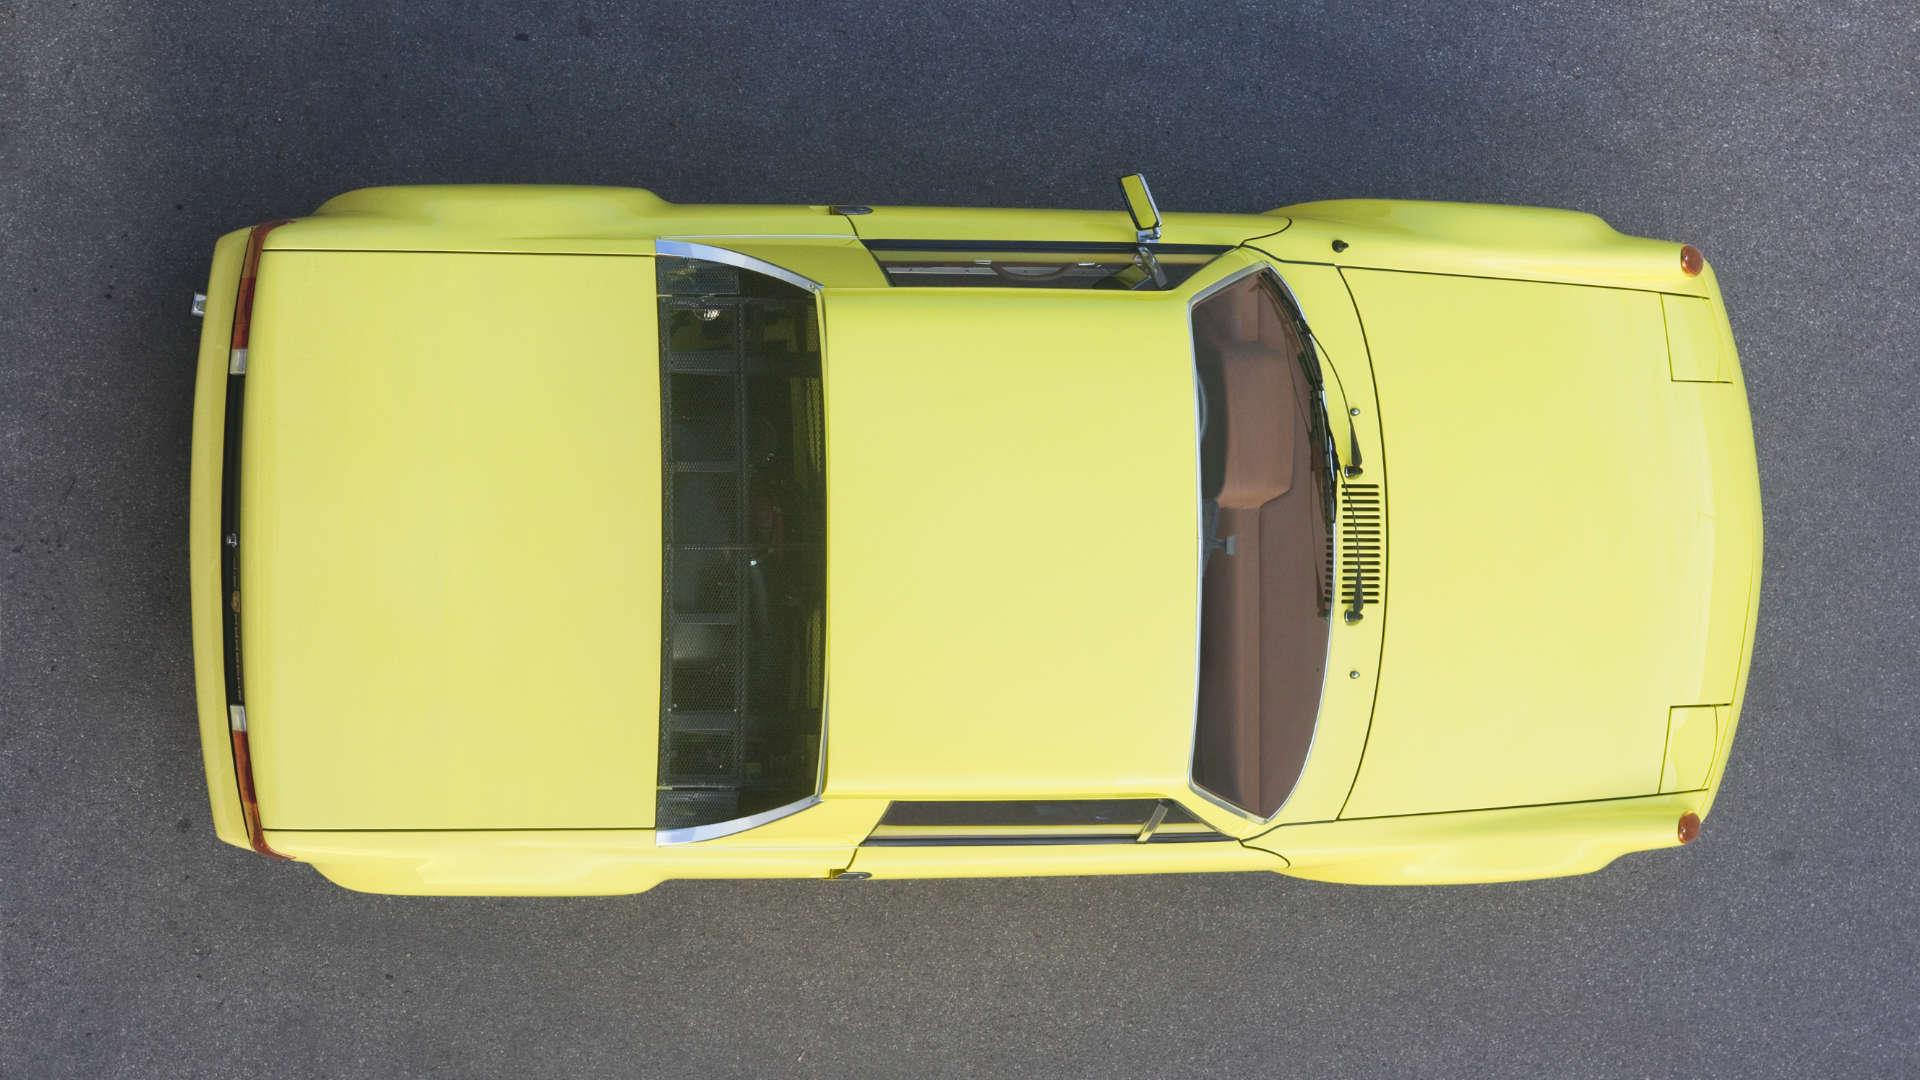 Porsche 916 Draufsicht